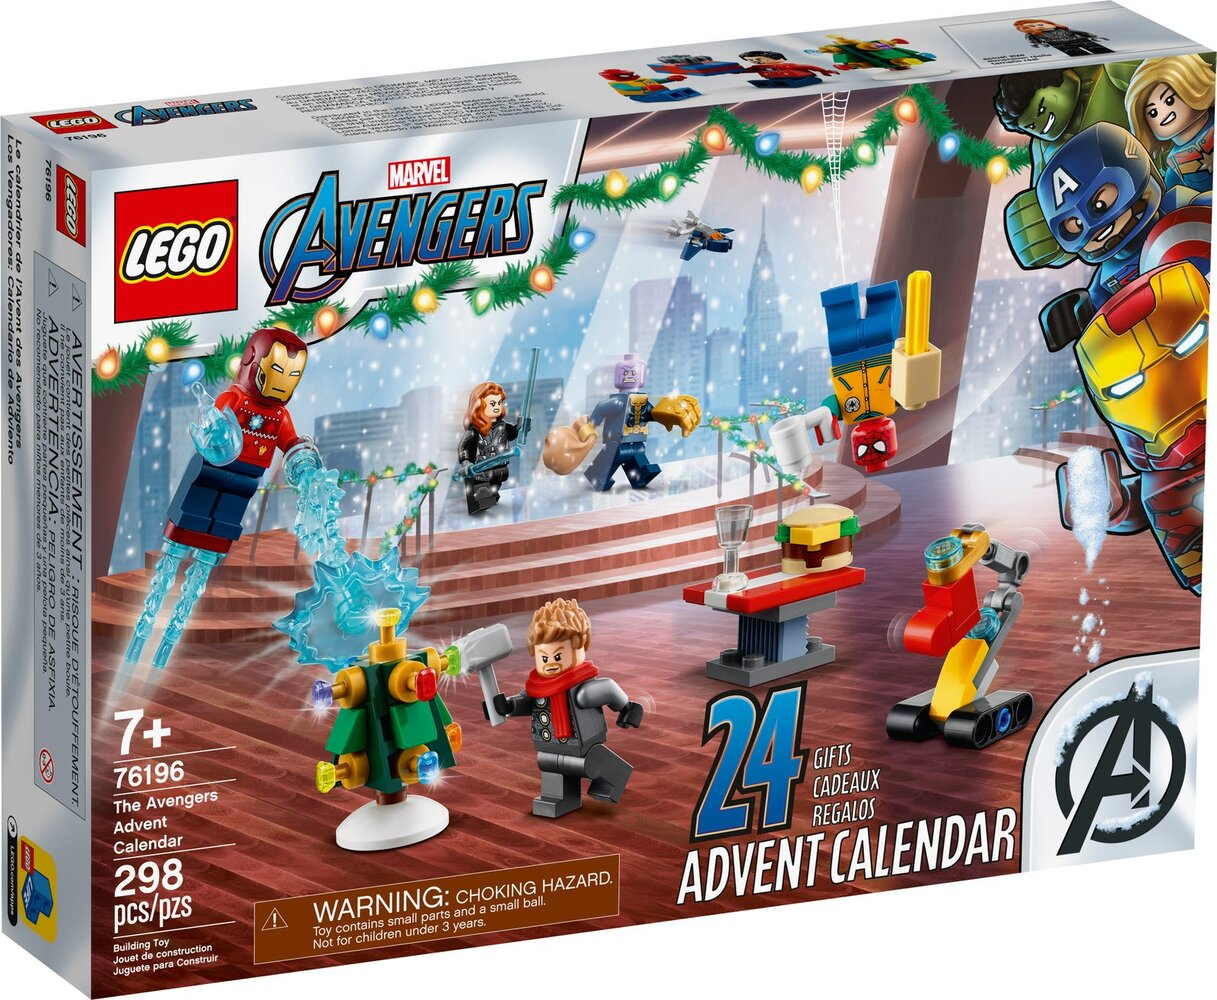 Marvel The Avengers Advent Calendar 2021